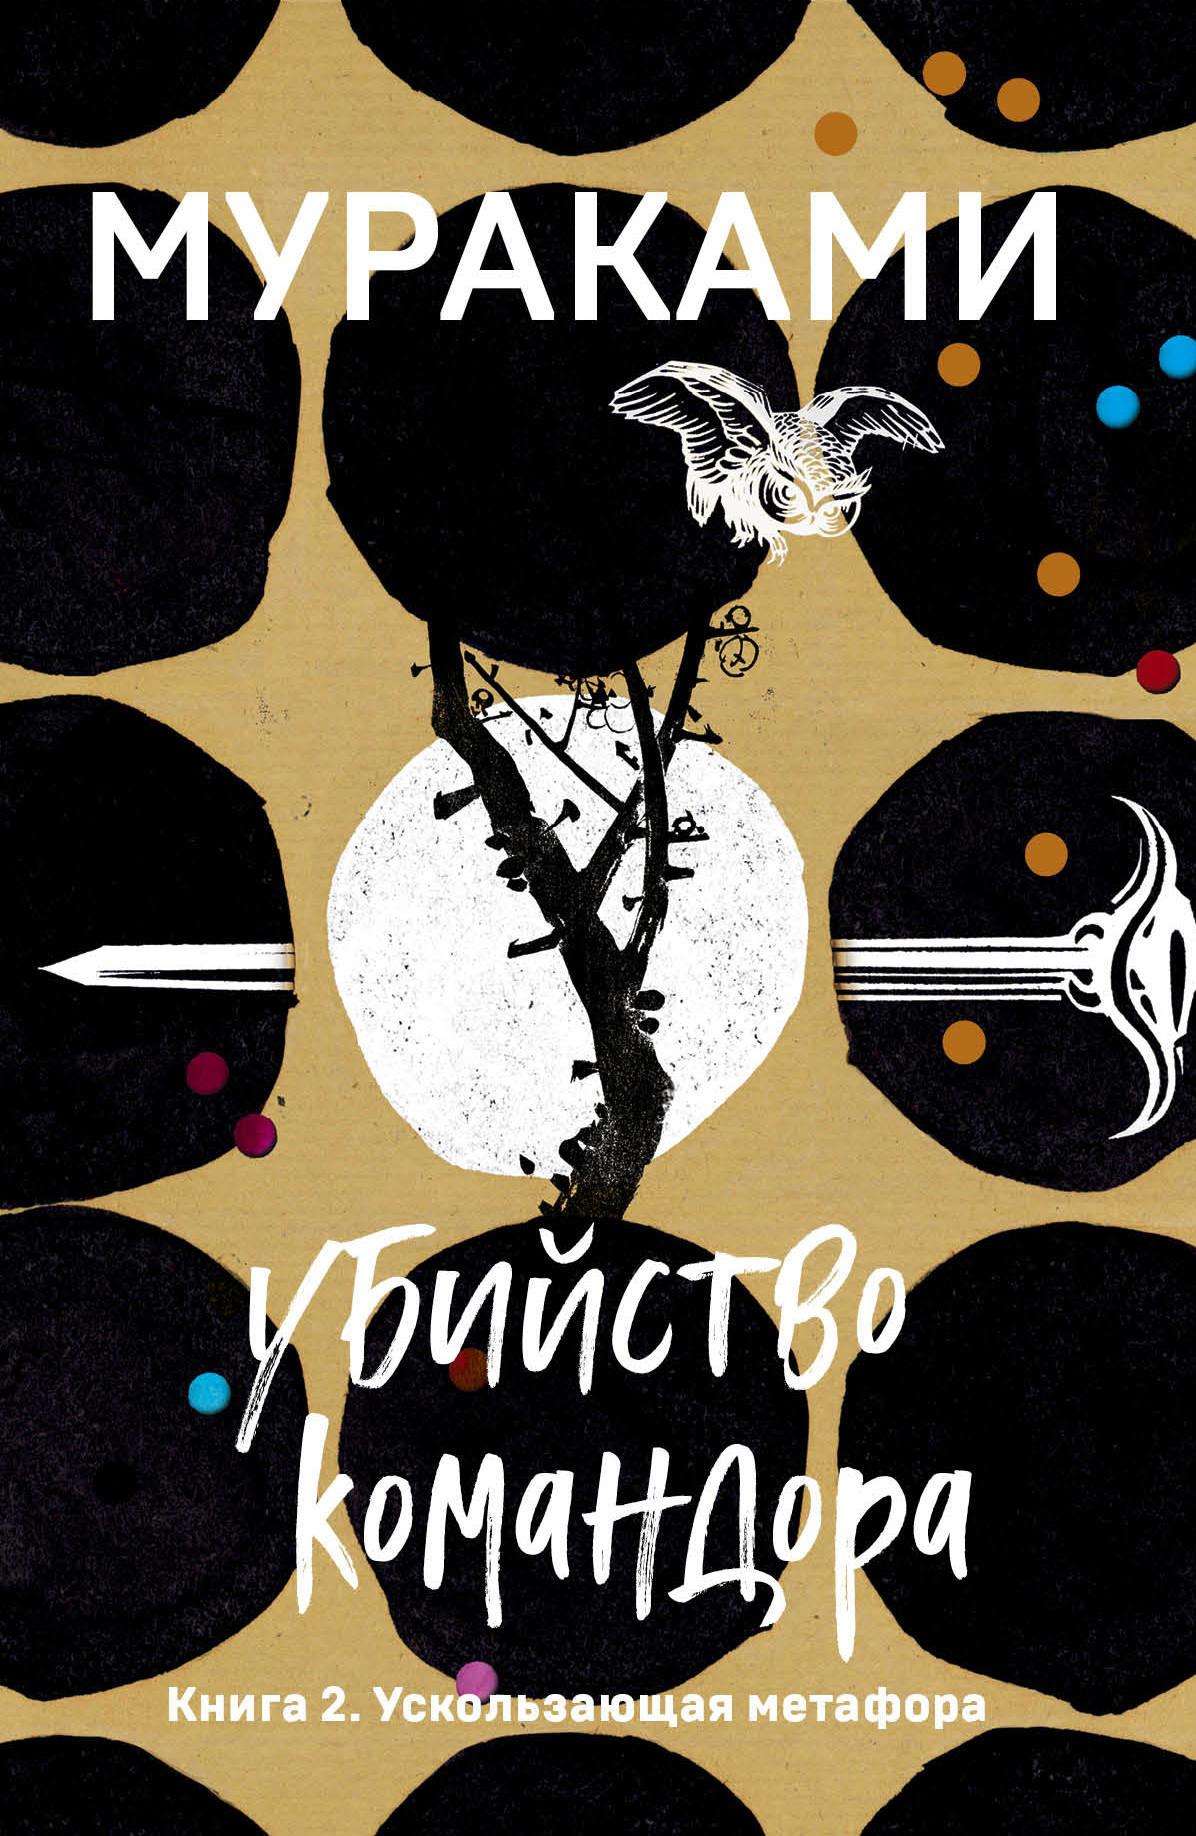 Убийство командора (комплект из 2 книг). Автор — Харуки Мураками. Переплет —